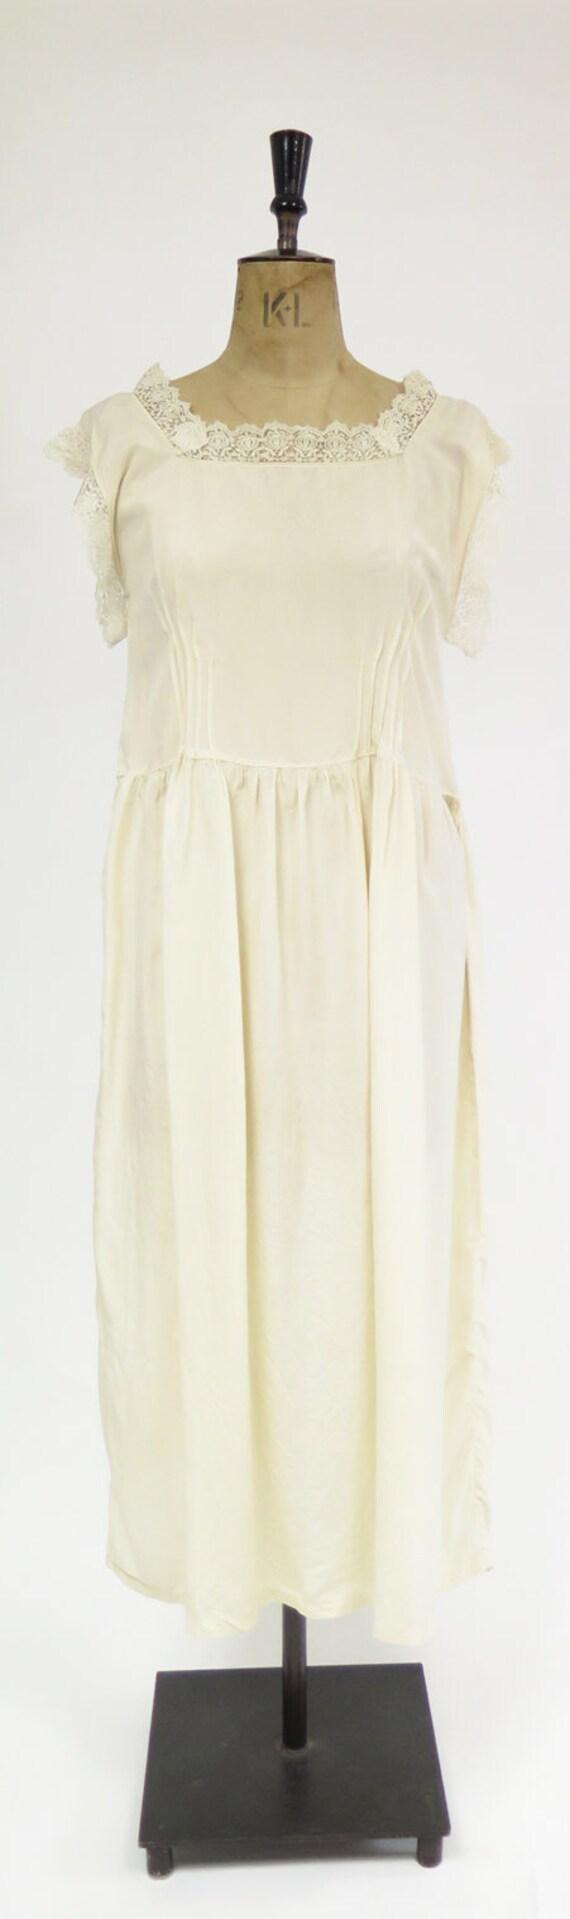 Original Vintage 1920s Deco Cream Silk And Lace D… - image 2